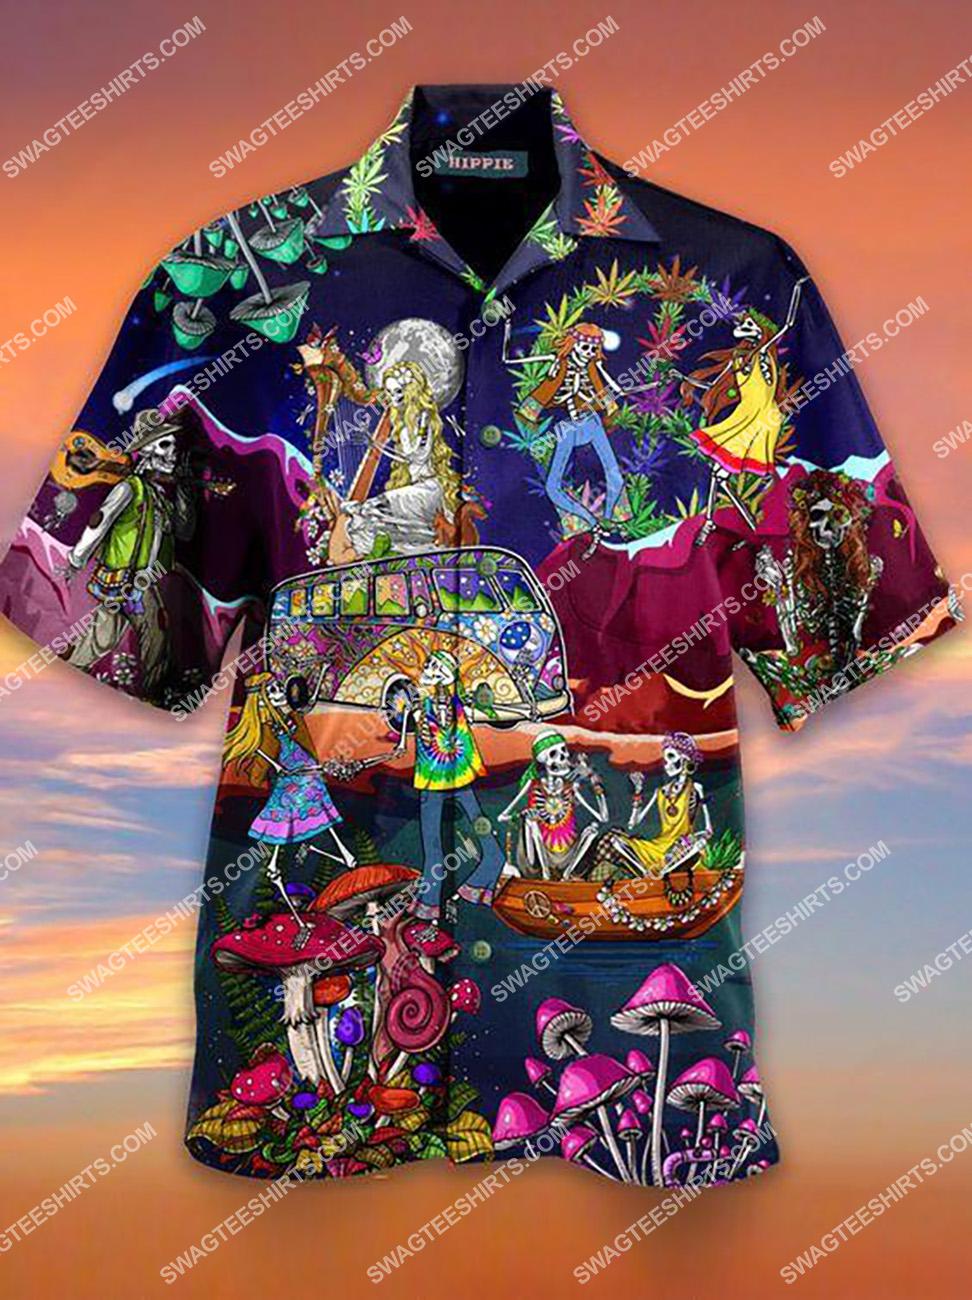 hippie lover skull all over printed hawaiian shirt 1(1)